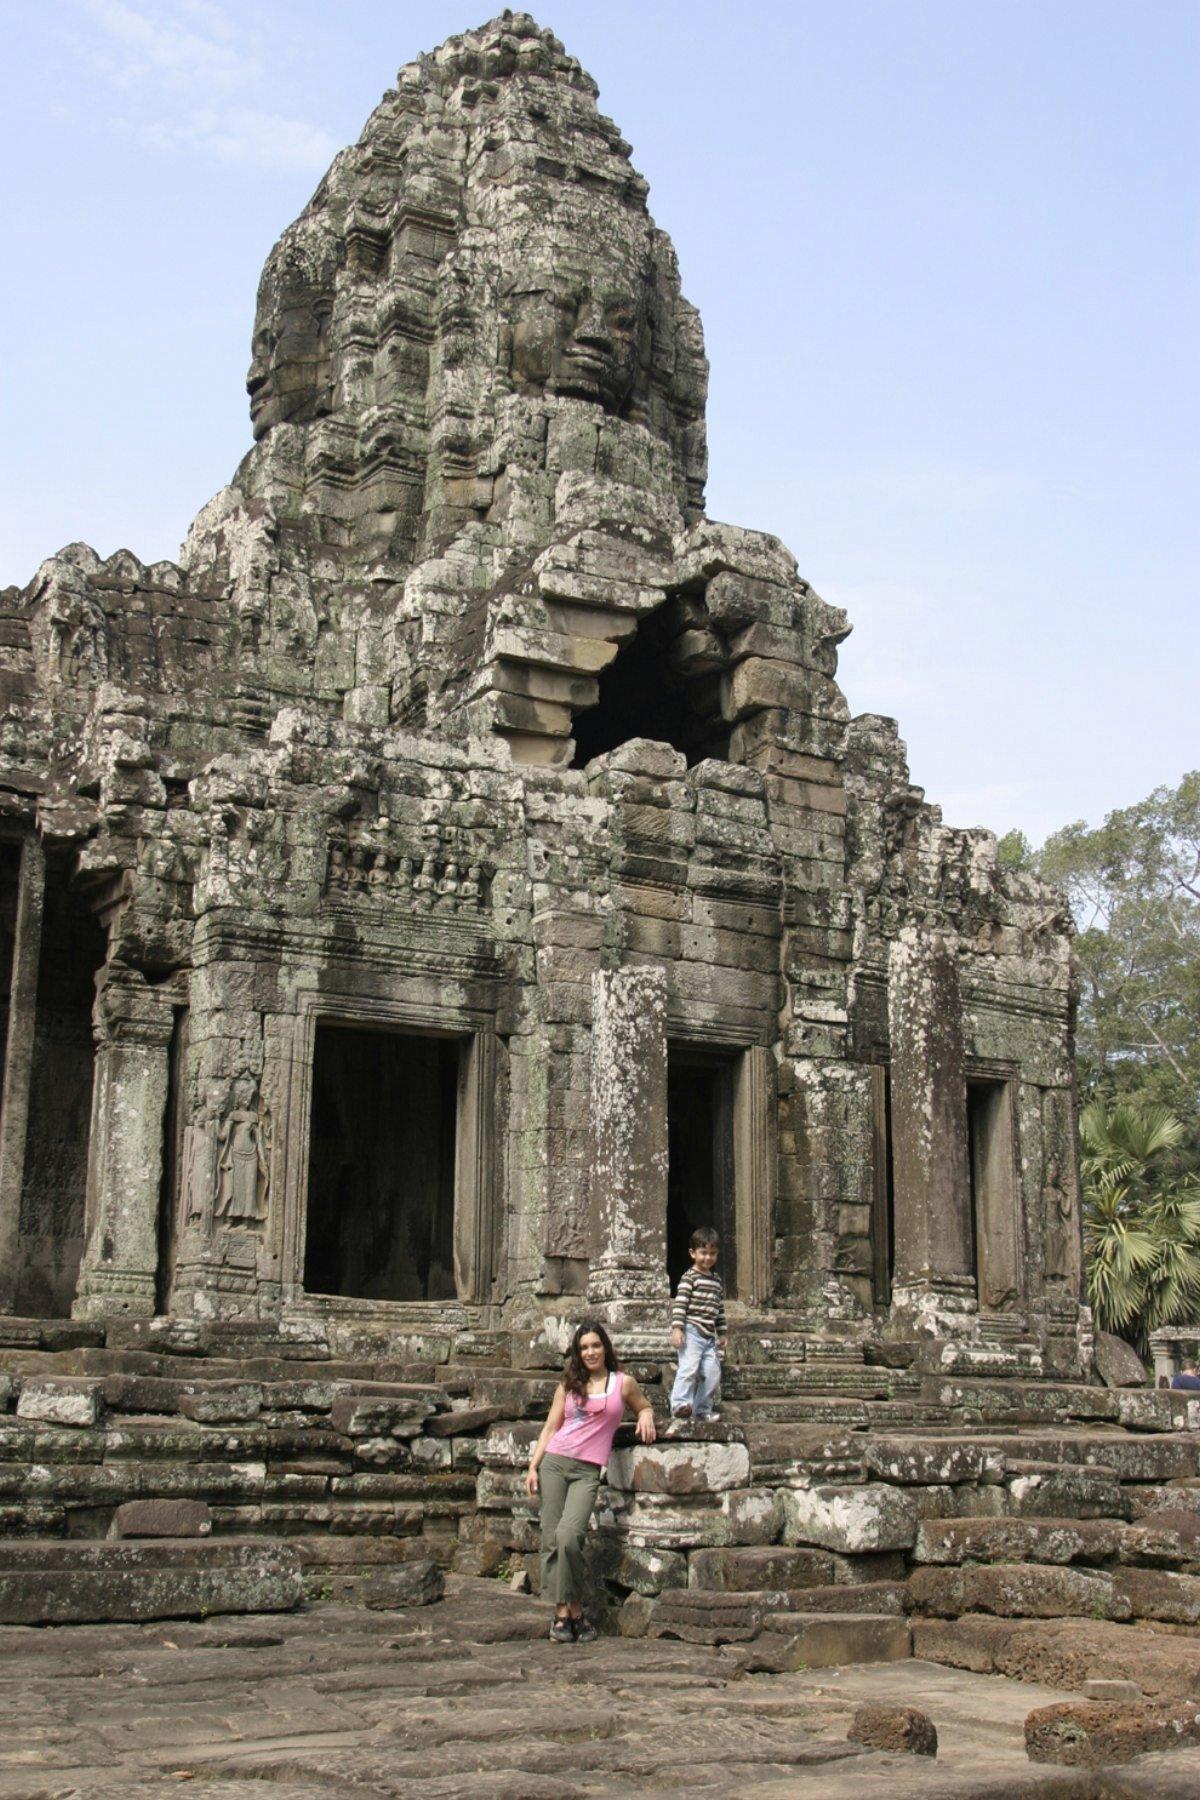 resized-cambodia-ld-cat-temple10-16-2011